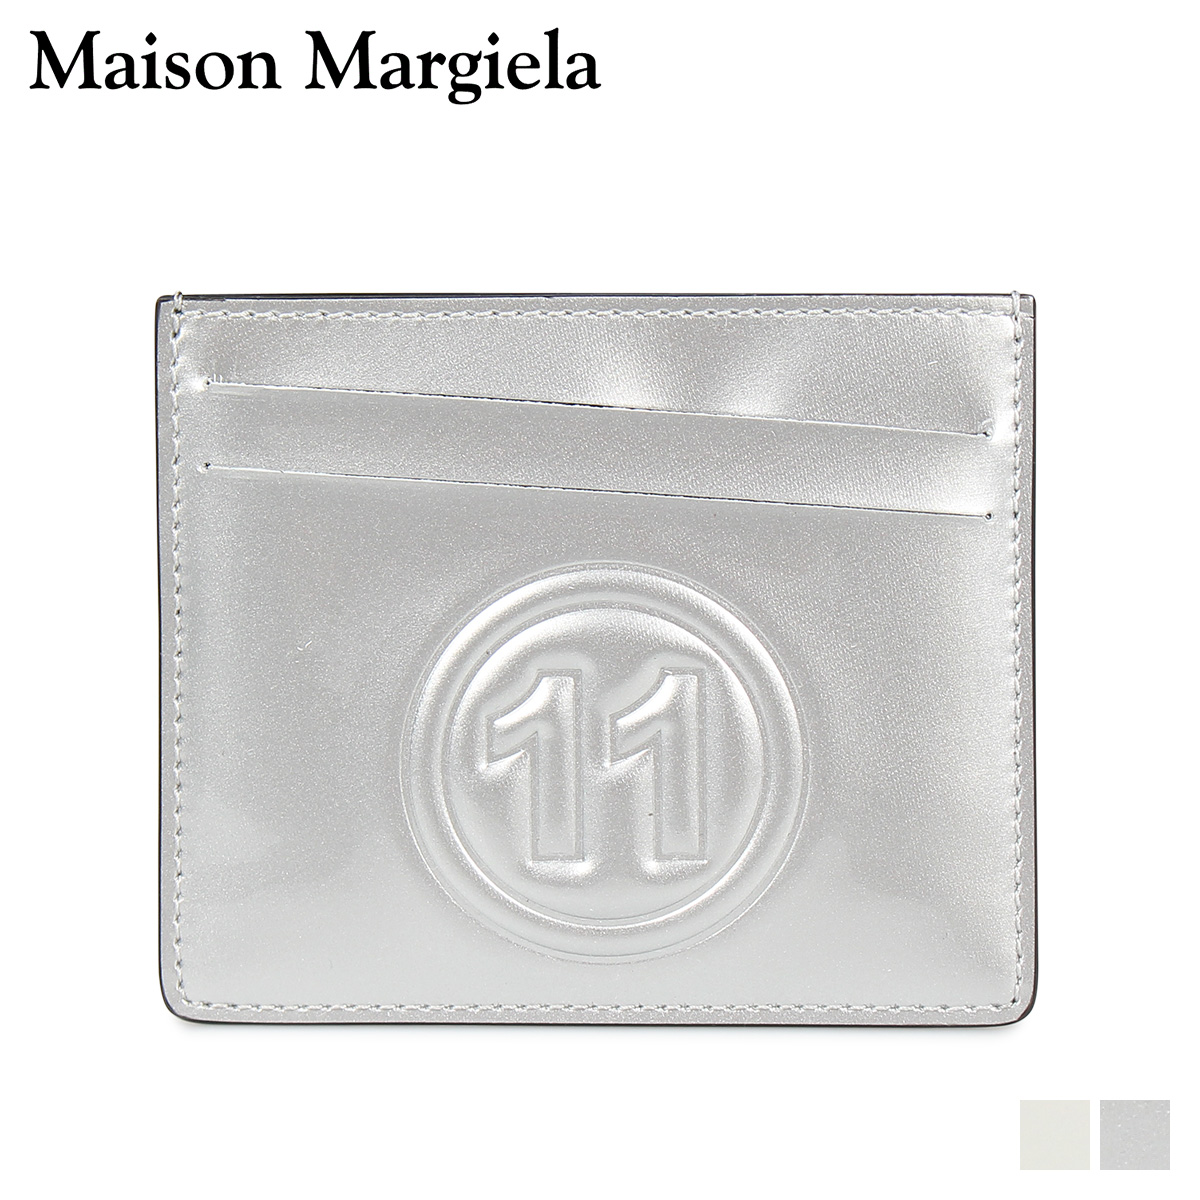 MAISON MARGIELA CARD CASE メゾンマルジェラ カードケース 名刺入れ 定期入れ メンズ レディース レザー ホワイト シルバー 白 S35UI0432 PR213